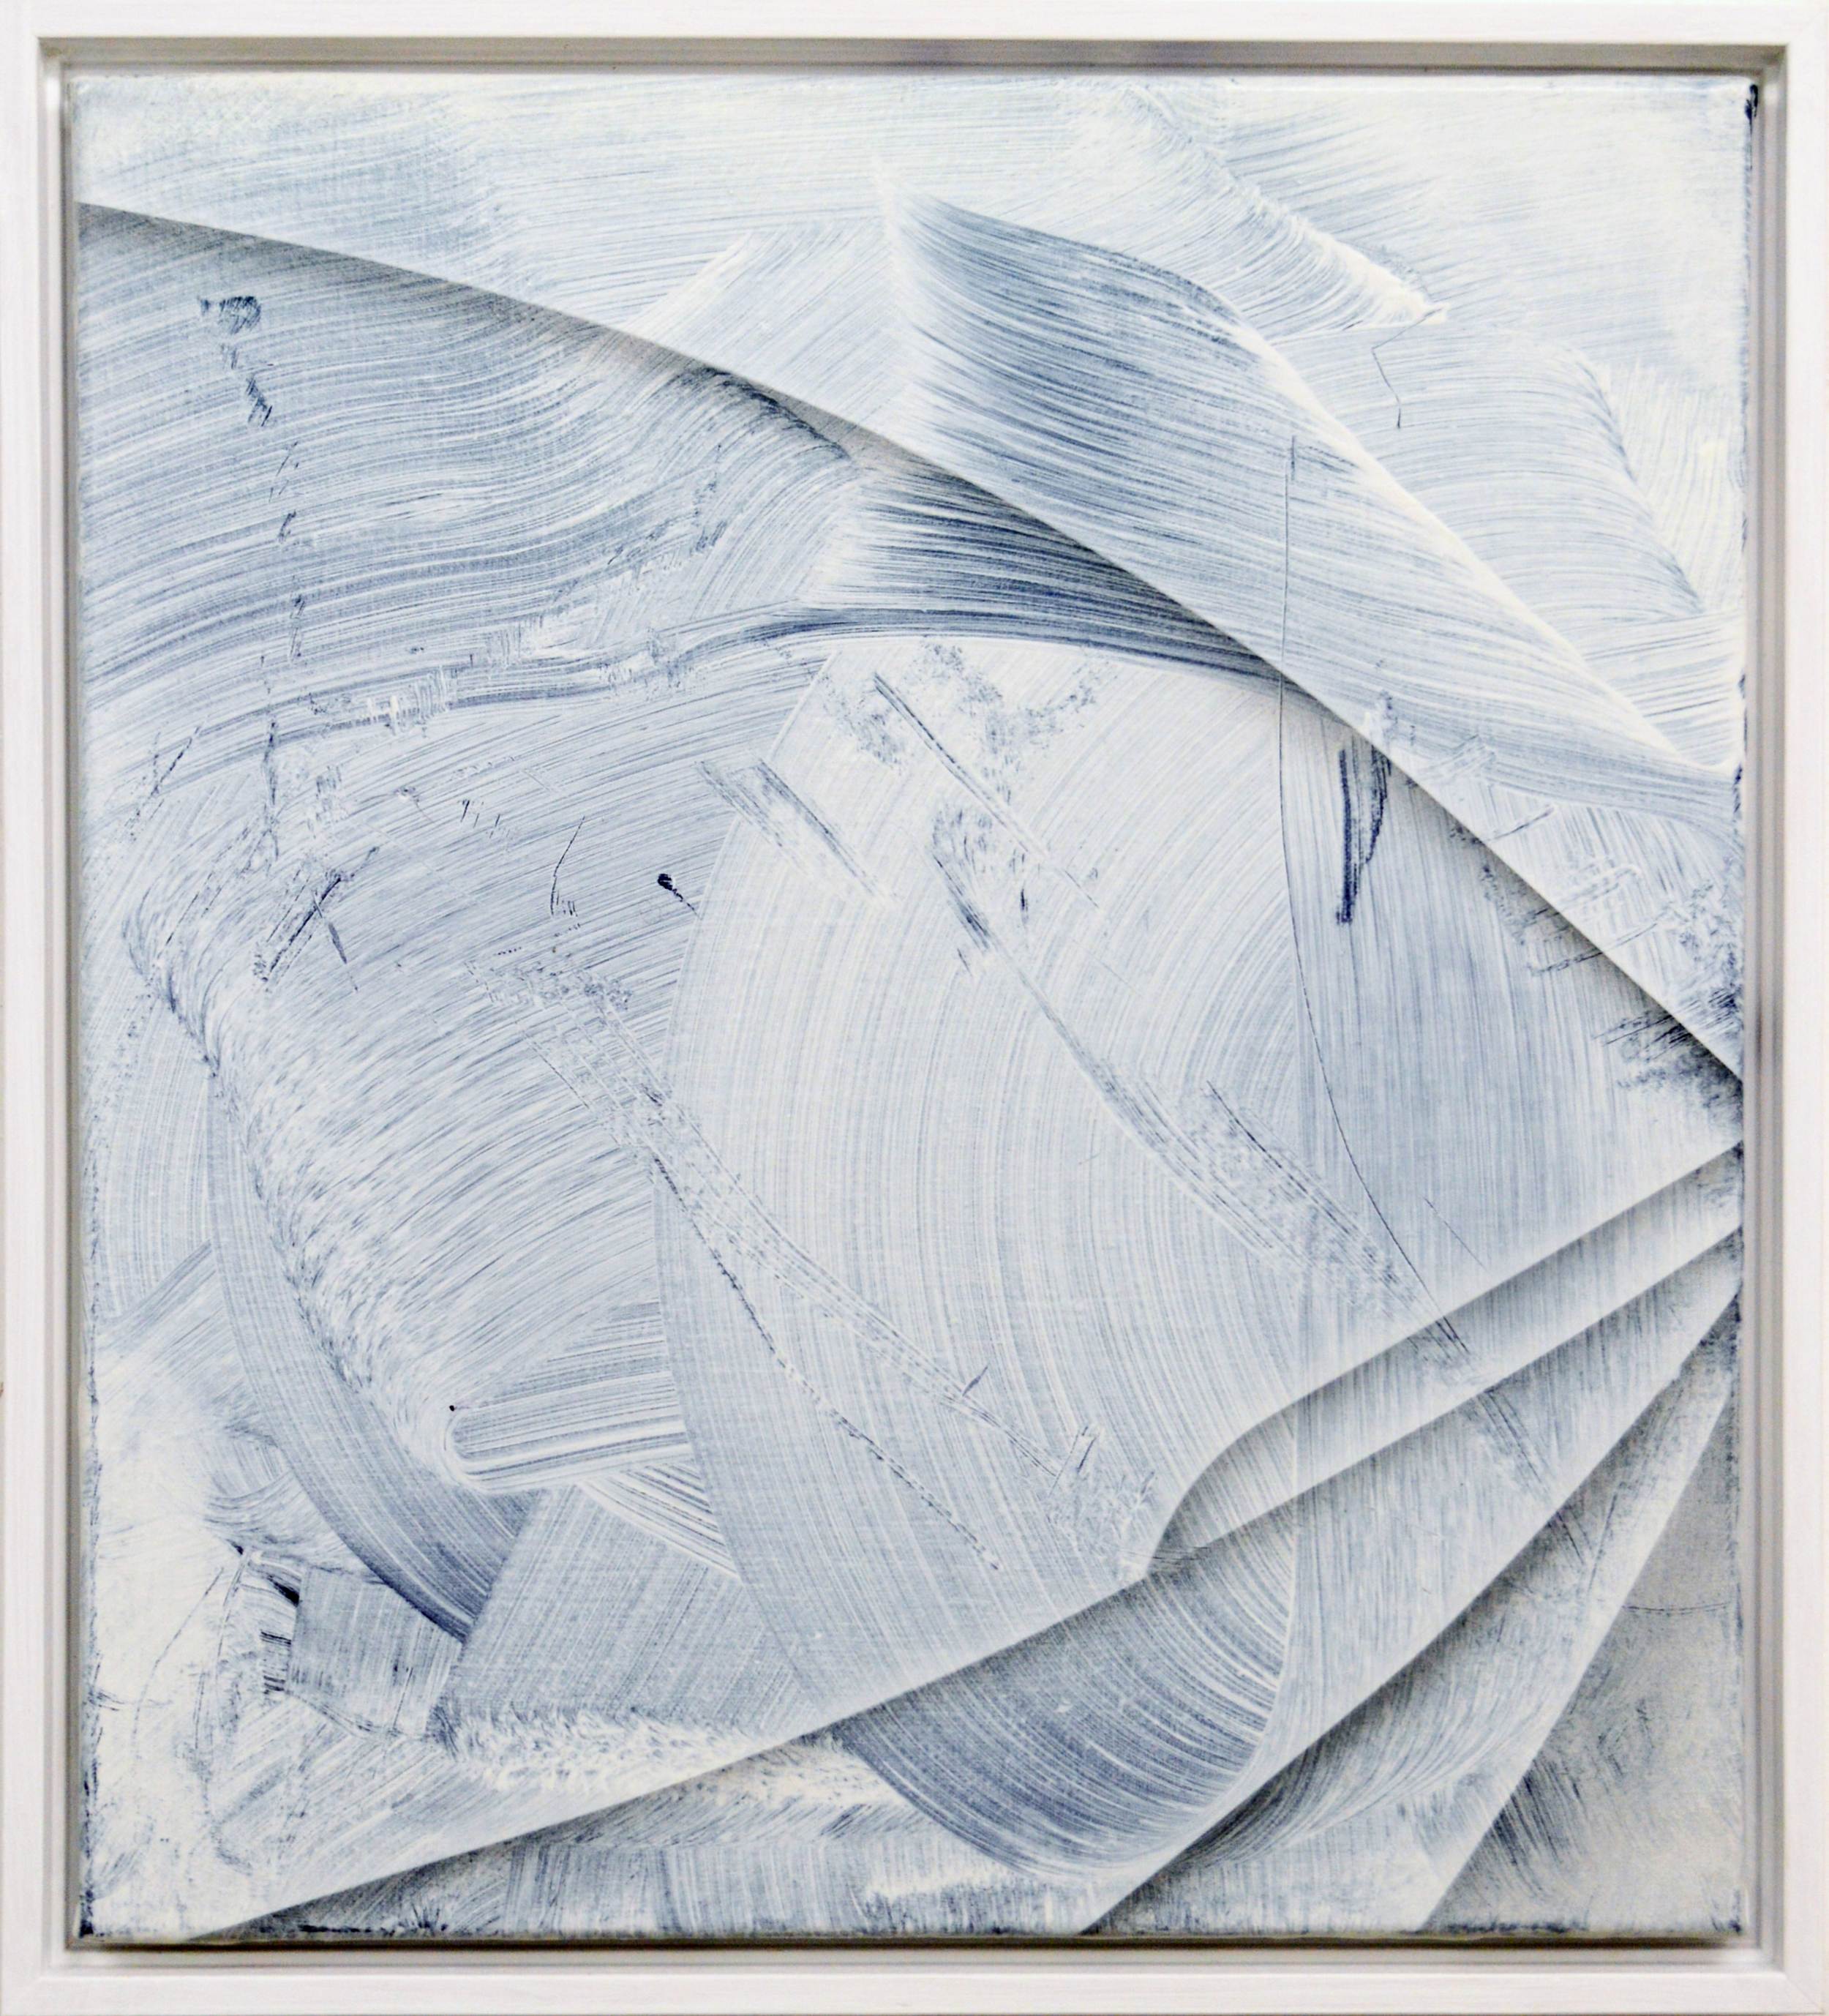 Silver Lining |2015 acrylic on linen 45 x 40 cm